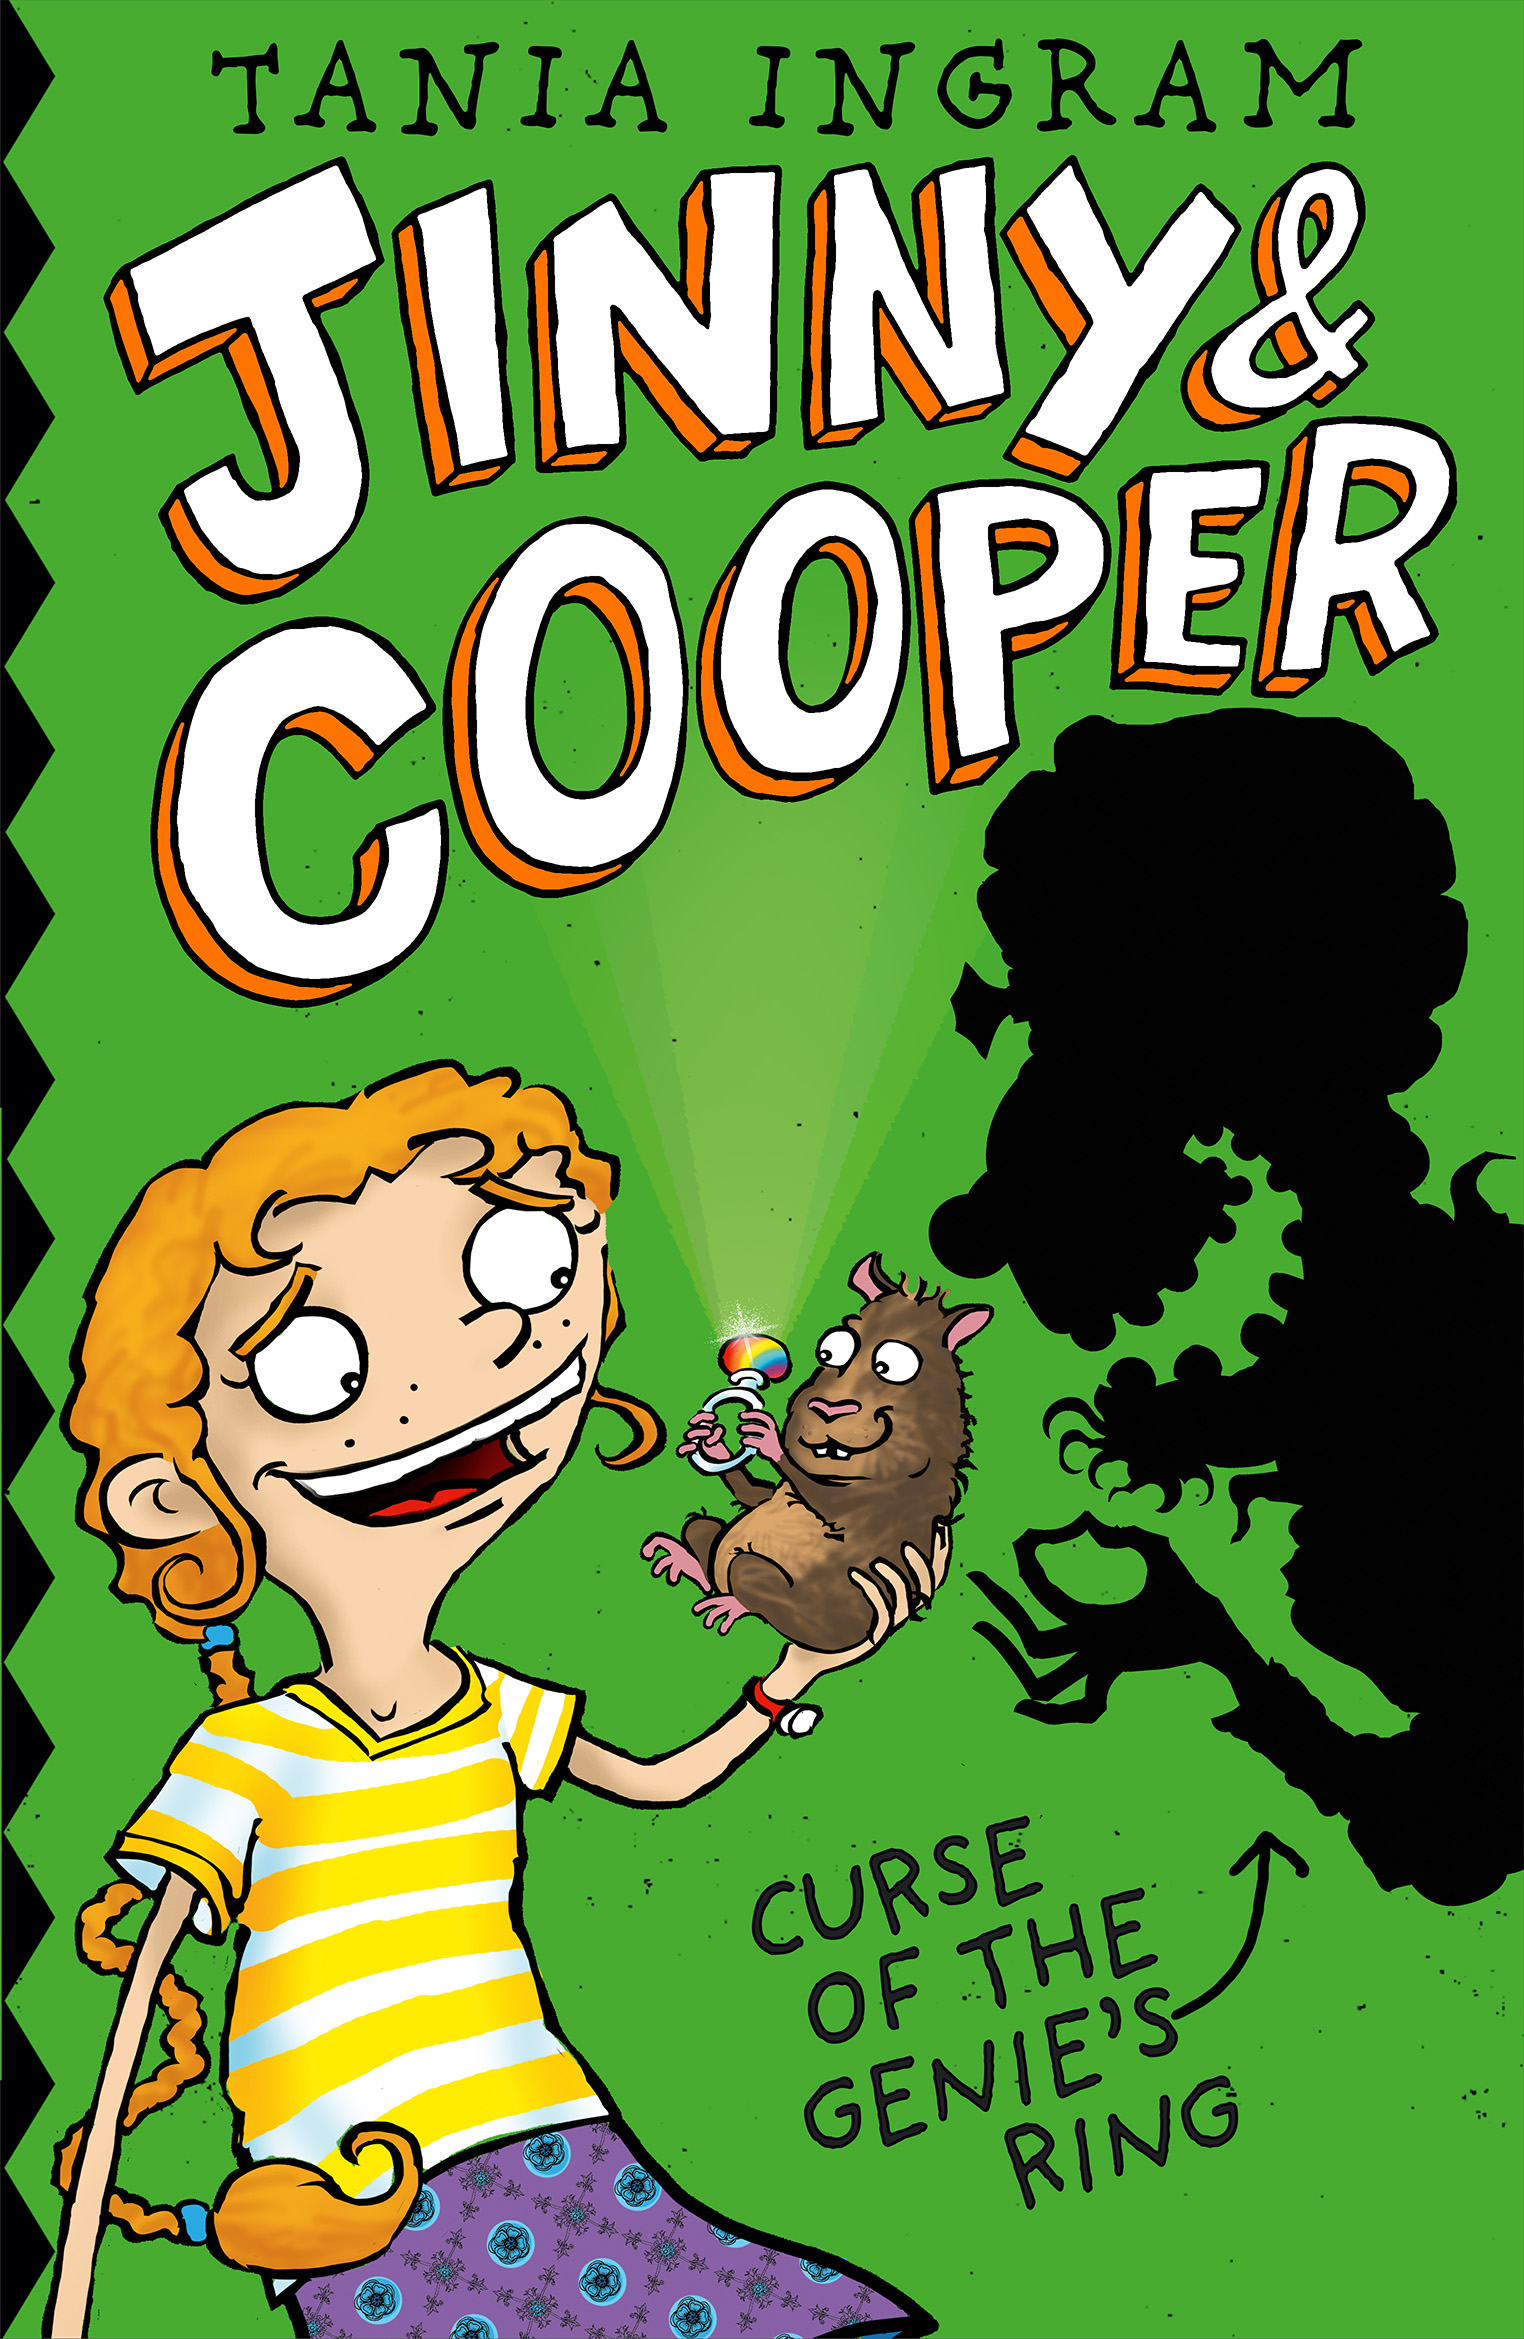 Jinny-Cooper-Curse-of-the-Genies-Ring.jpg